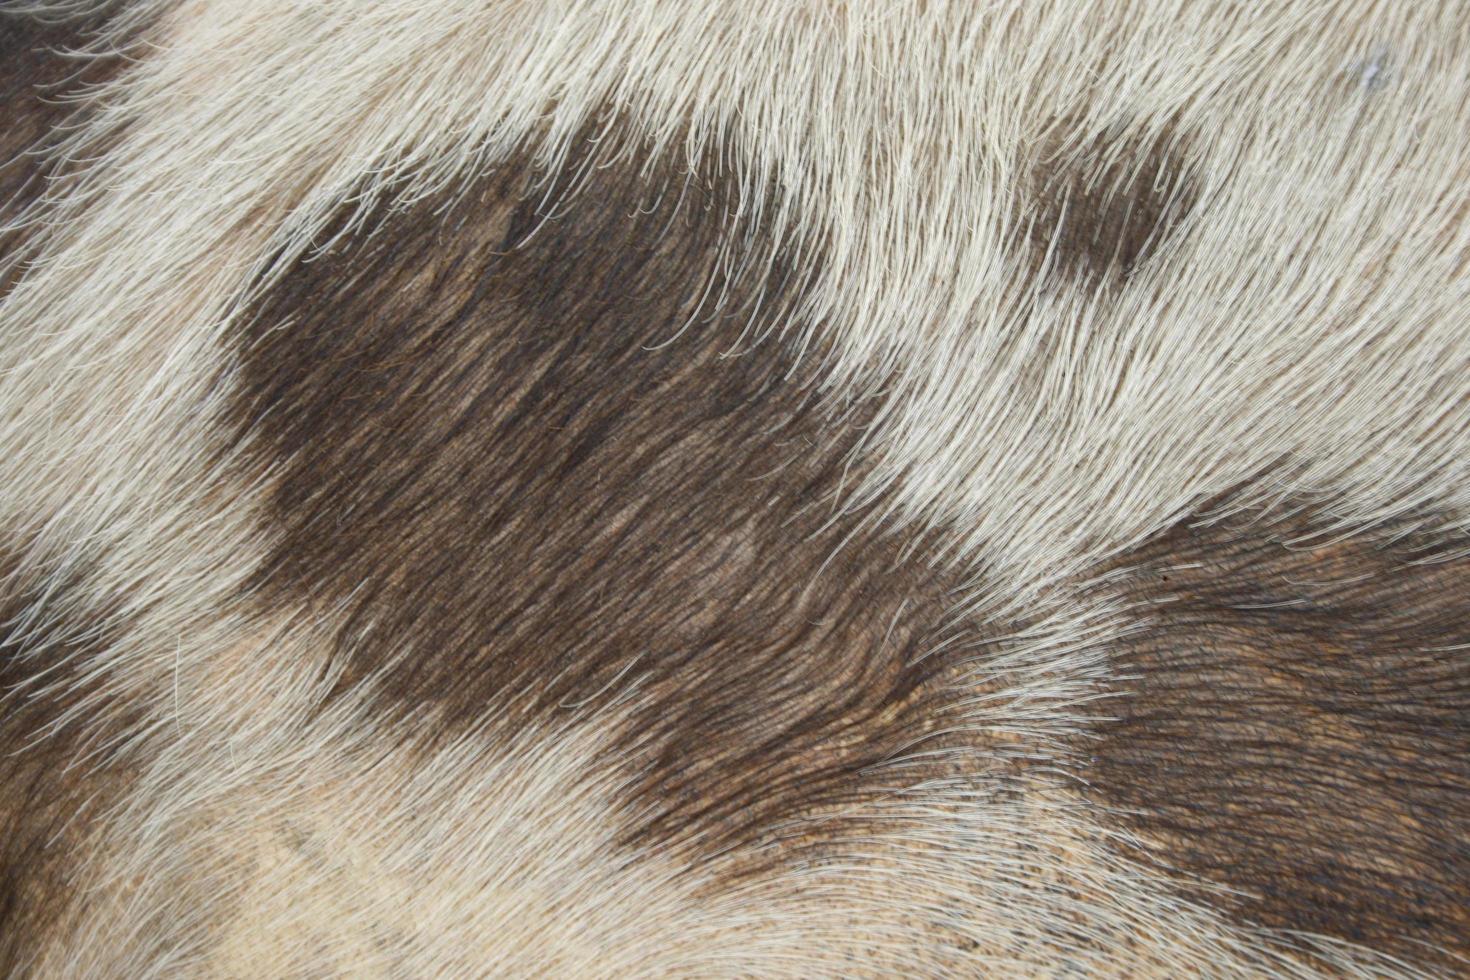 primer plano de piel de cerdo foto